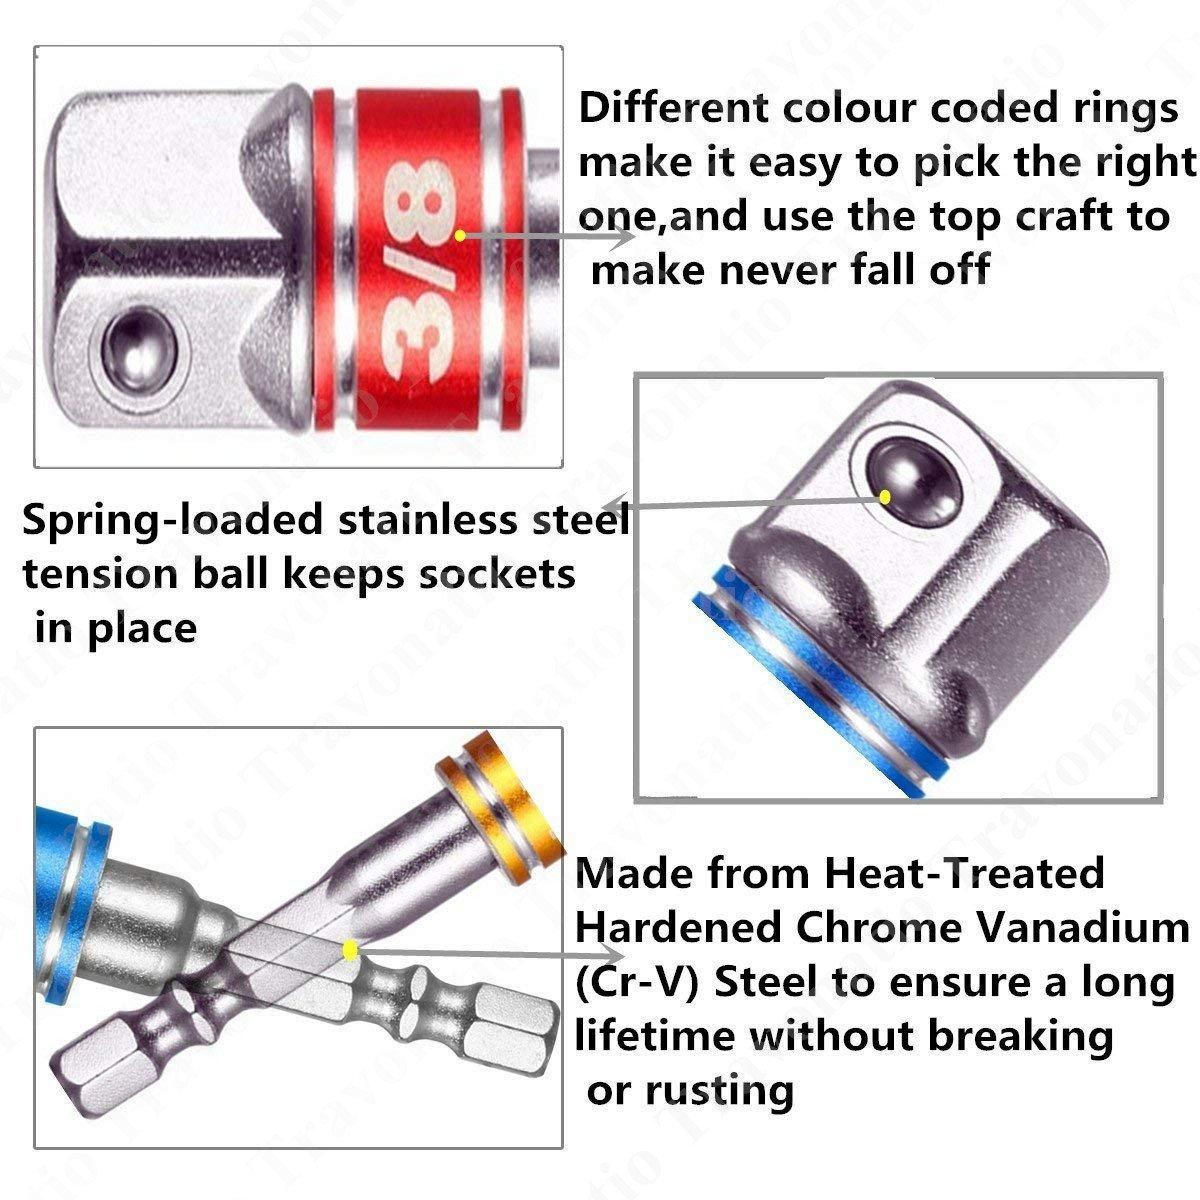 Gift 3Pcs Socket Adapter Impact Hex Shank Drill Bits Bar Set 1//4 3//8 1//2 1//4 Hex Shank Bit Socket Screwdriver Holder Adapter Power Drill Attachment Travonatio 105° Right Angle Drill Adapter Extension Tool+